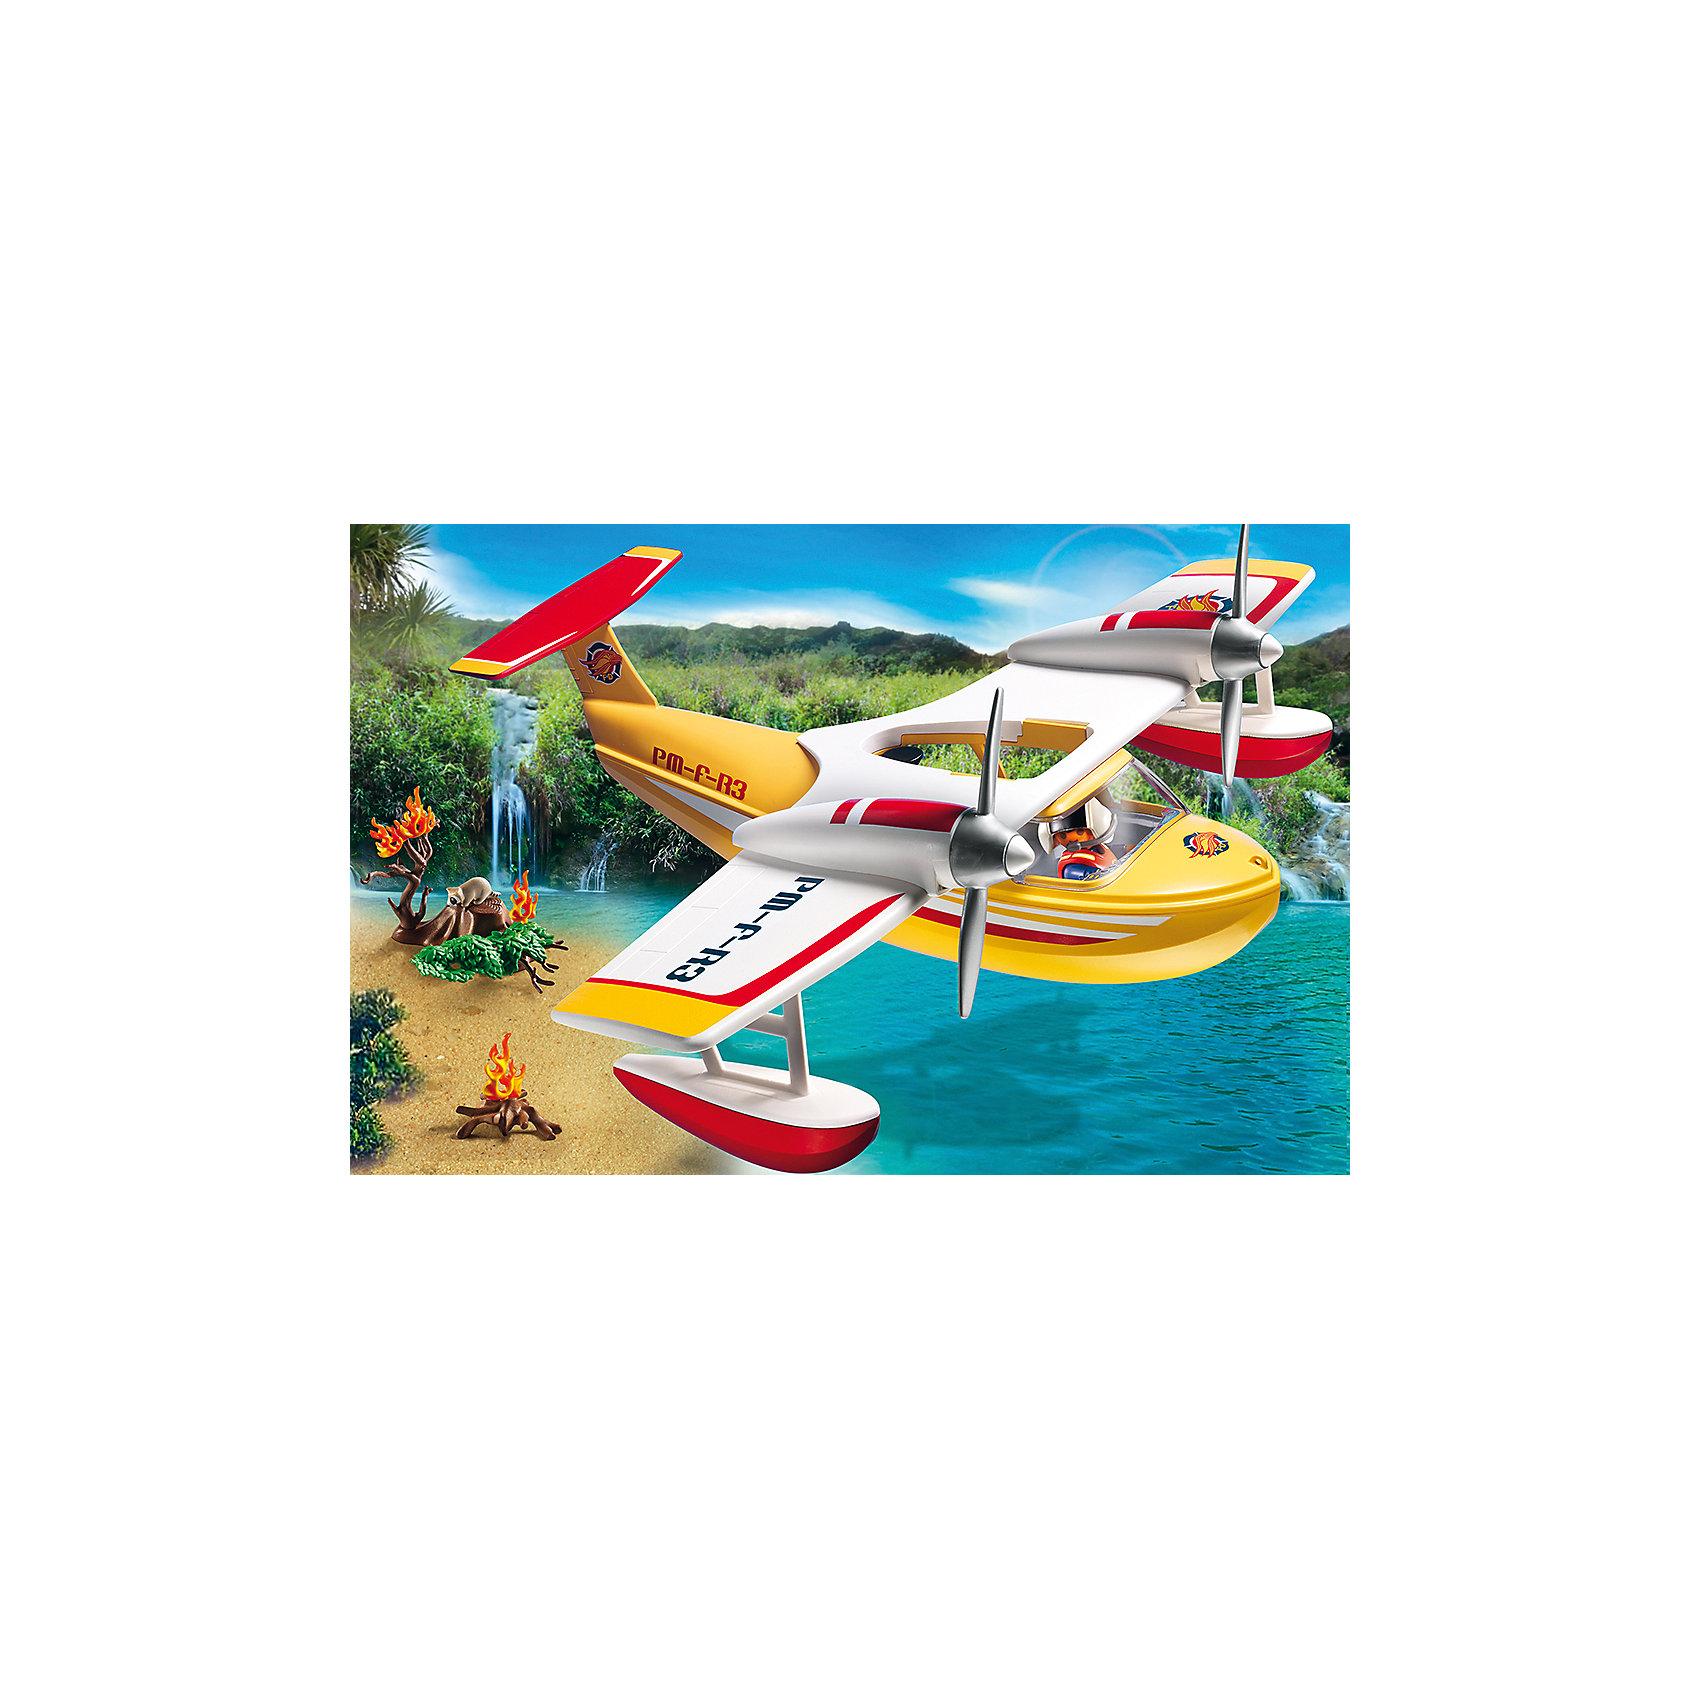 PLAYMOBIL® В Поисках Приключений: Самолет борется с огнем, PLAYMOBIL playmobil® зоопарк стая фламинго playmobil